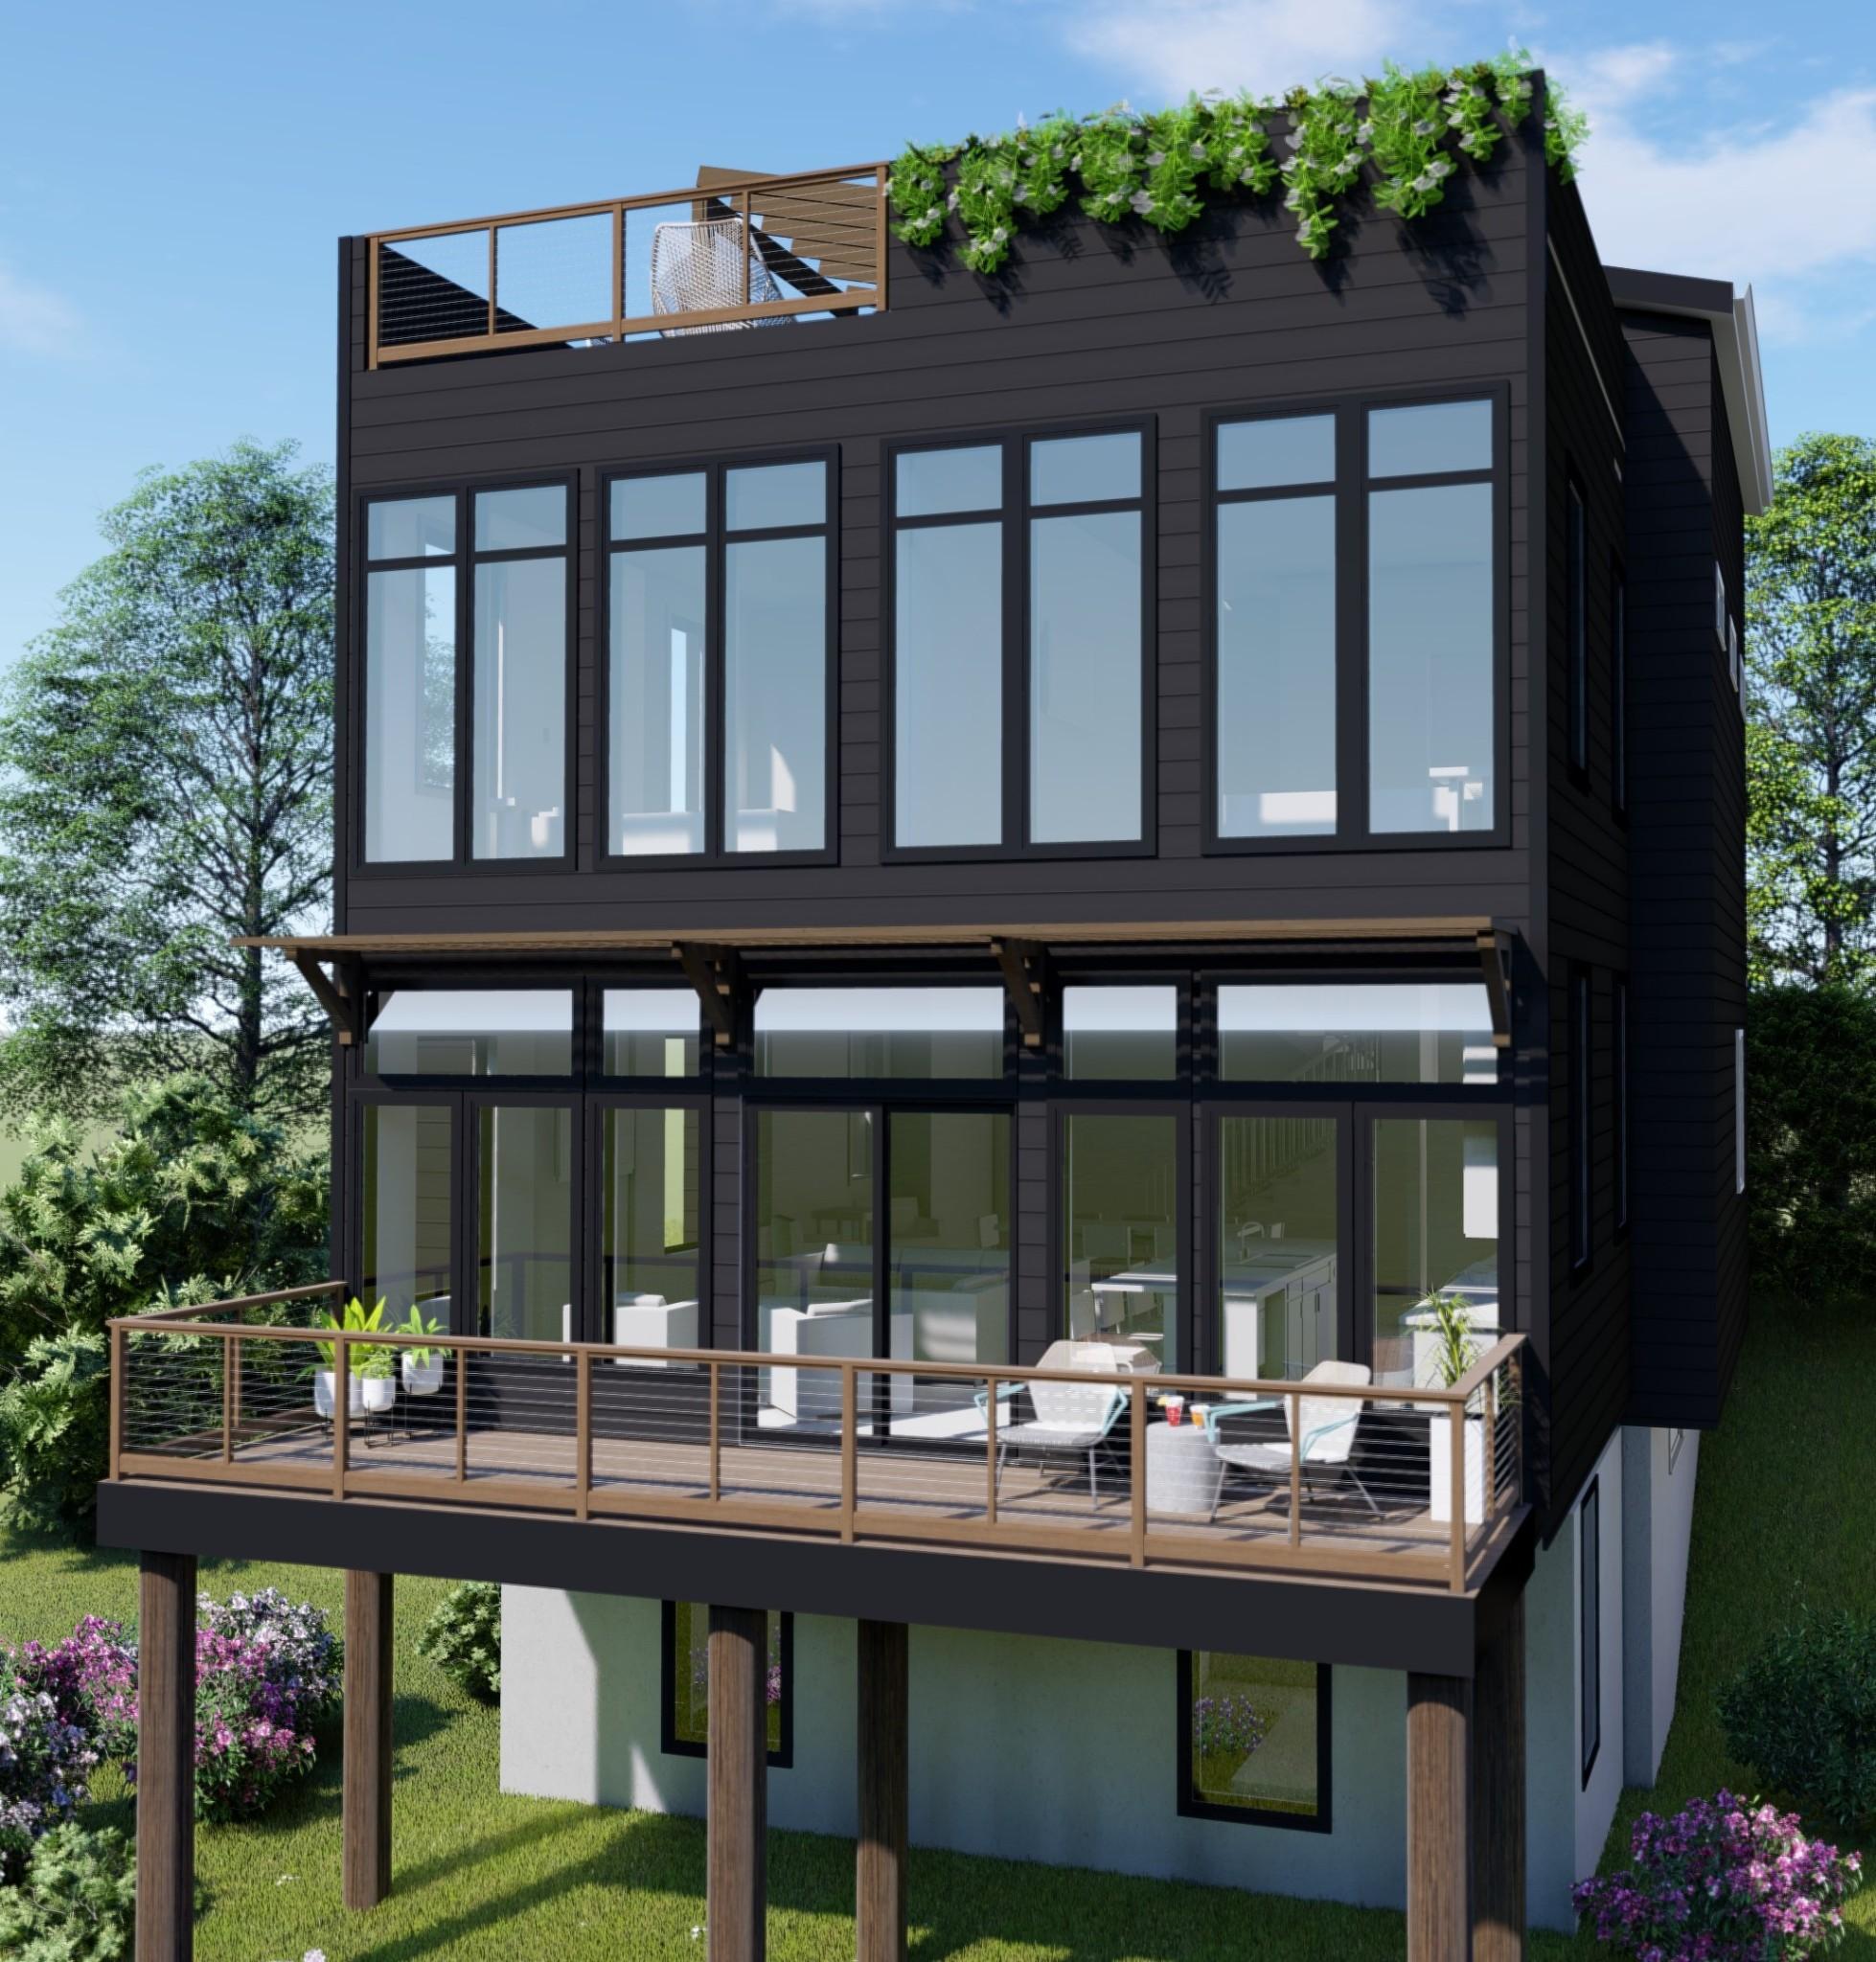 1109 Ozark St, Nashville, TN 37206 - Nashville, TN real estate listing